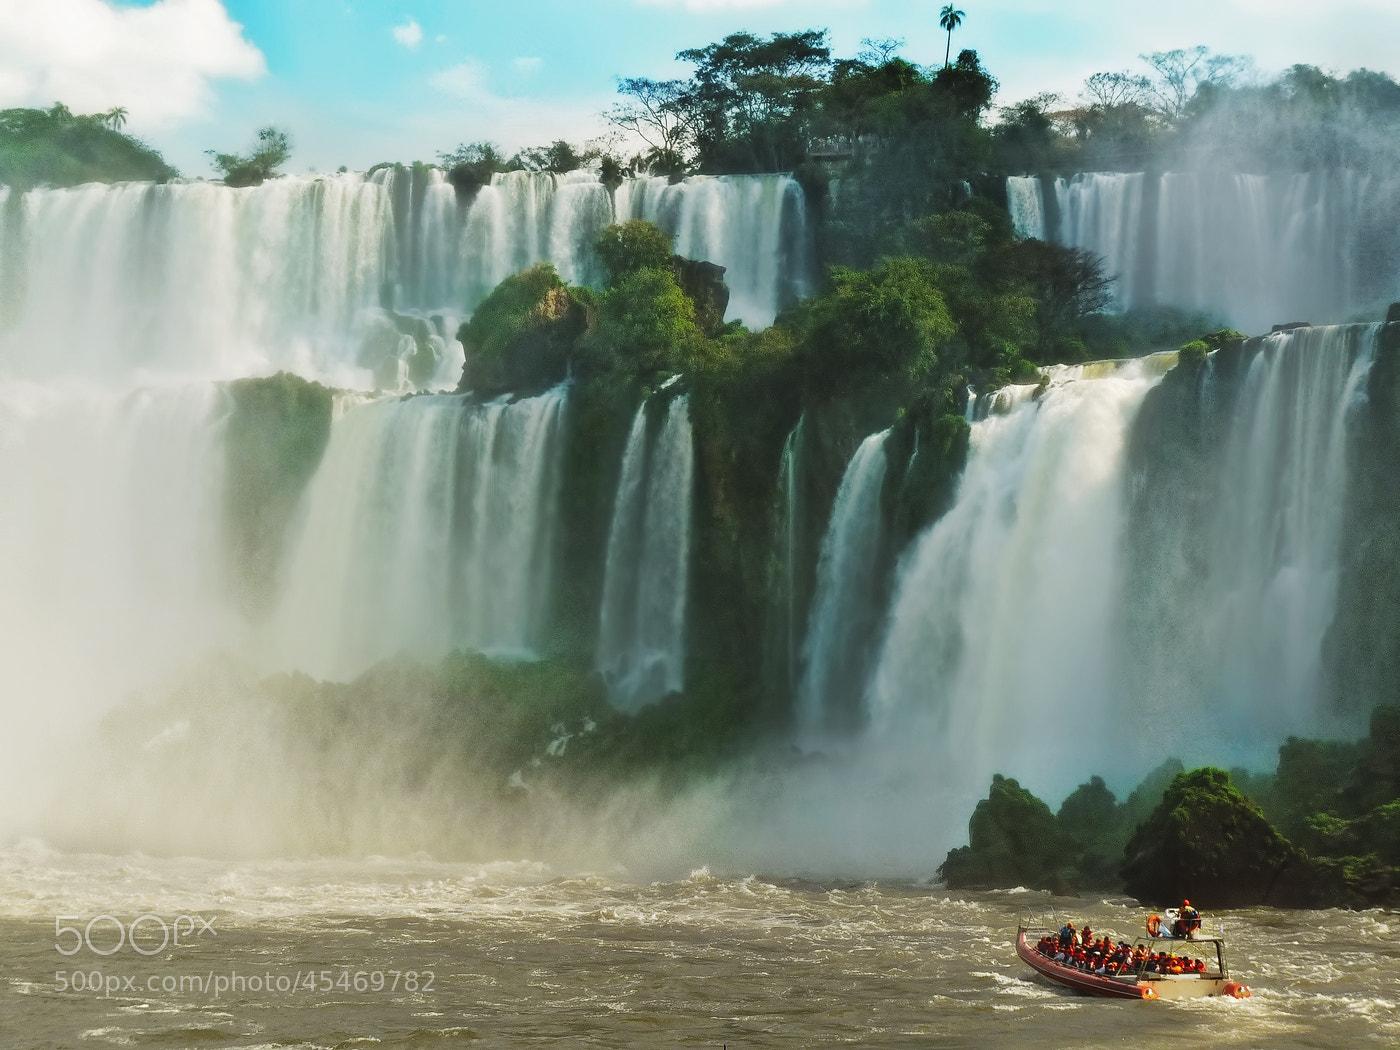 Photograph Ride at Iguazu Falls by Rafael Defavari on 500px